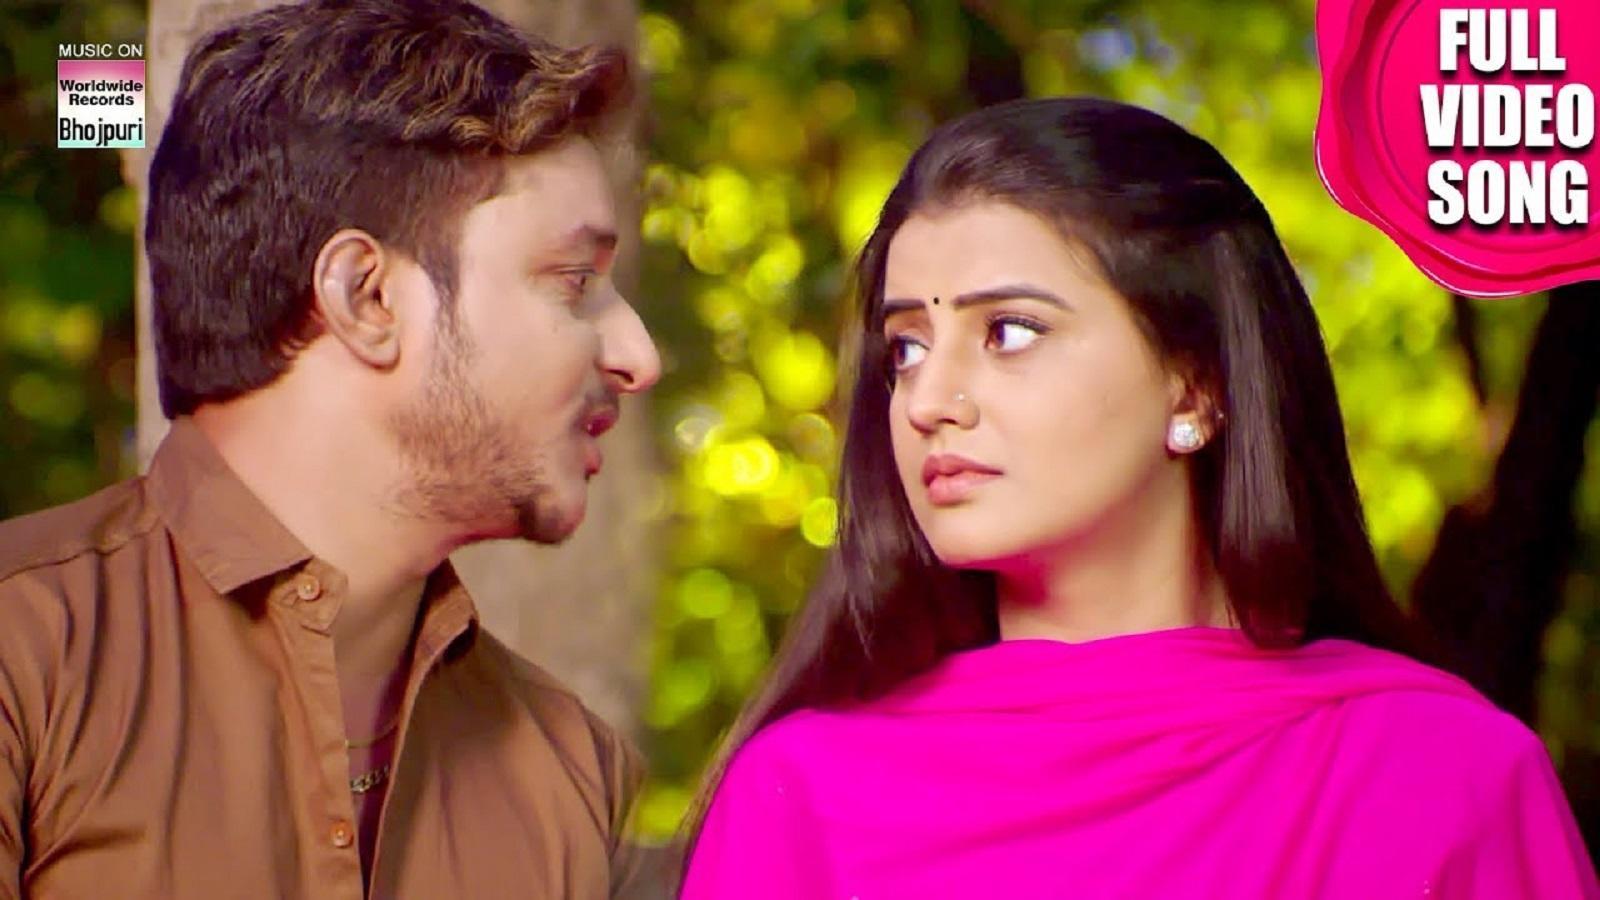 New Sad Songs Videos 2020: Latest Bhojpuri Song 'Tu Hamke Bhula Jahiye' Ft.  Akshara Singh and Amrish Singh